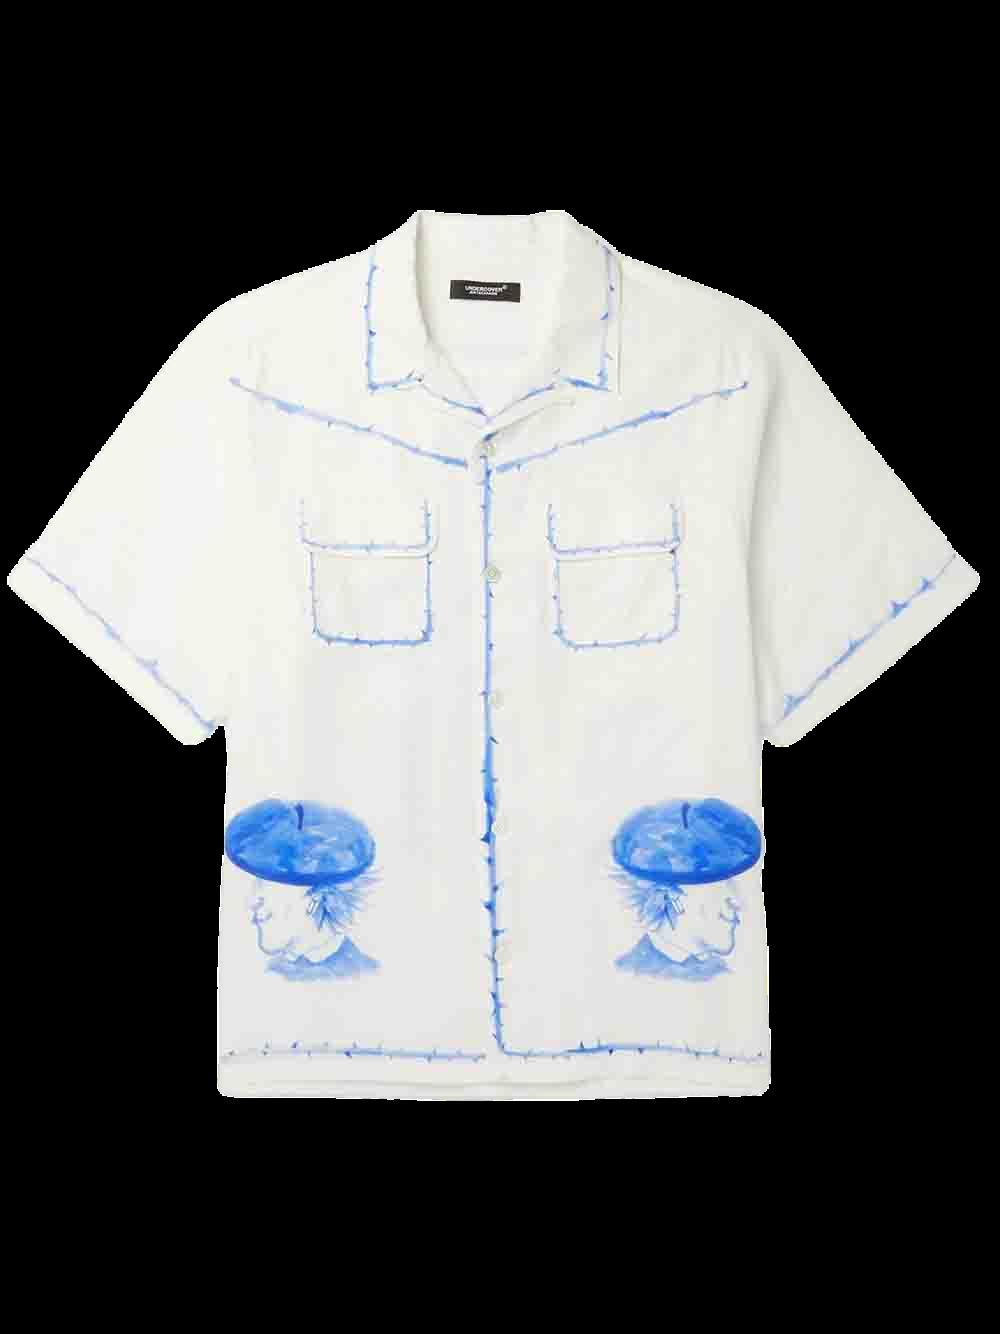 Männermode Trend 2021: Kurzarmhemden für Männer Street Style